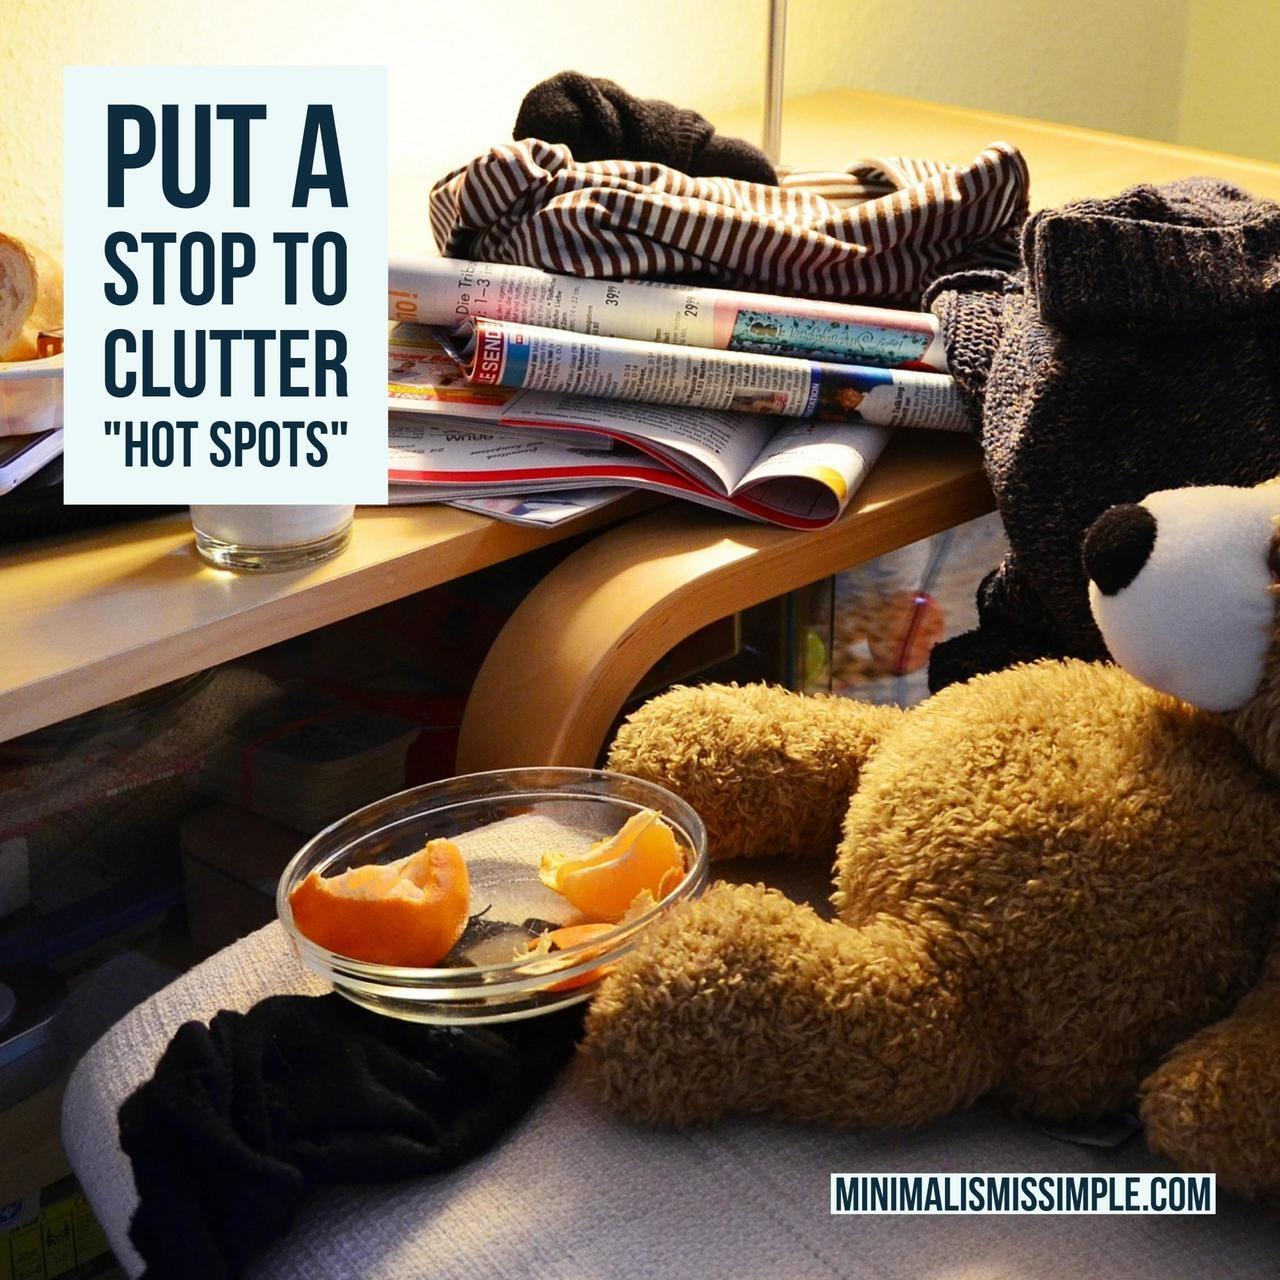 clutter hot spots minimalismissimple.com